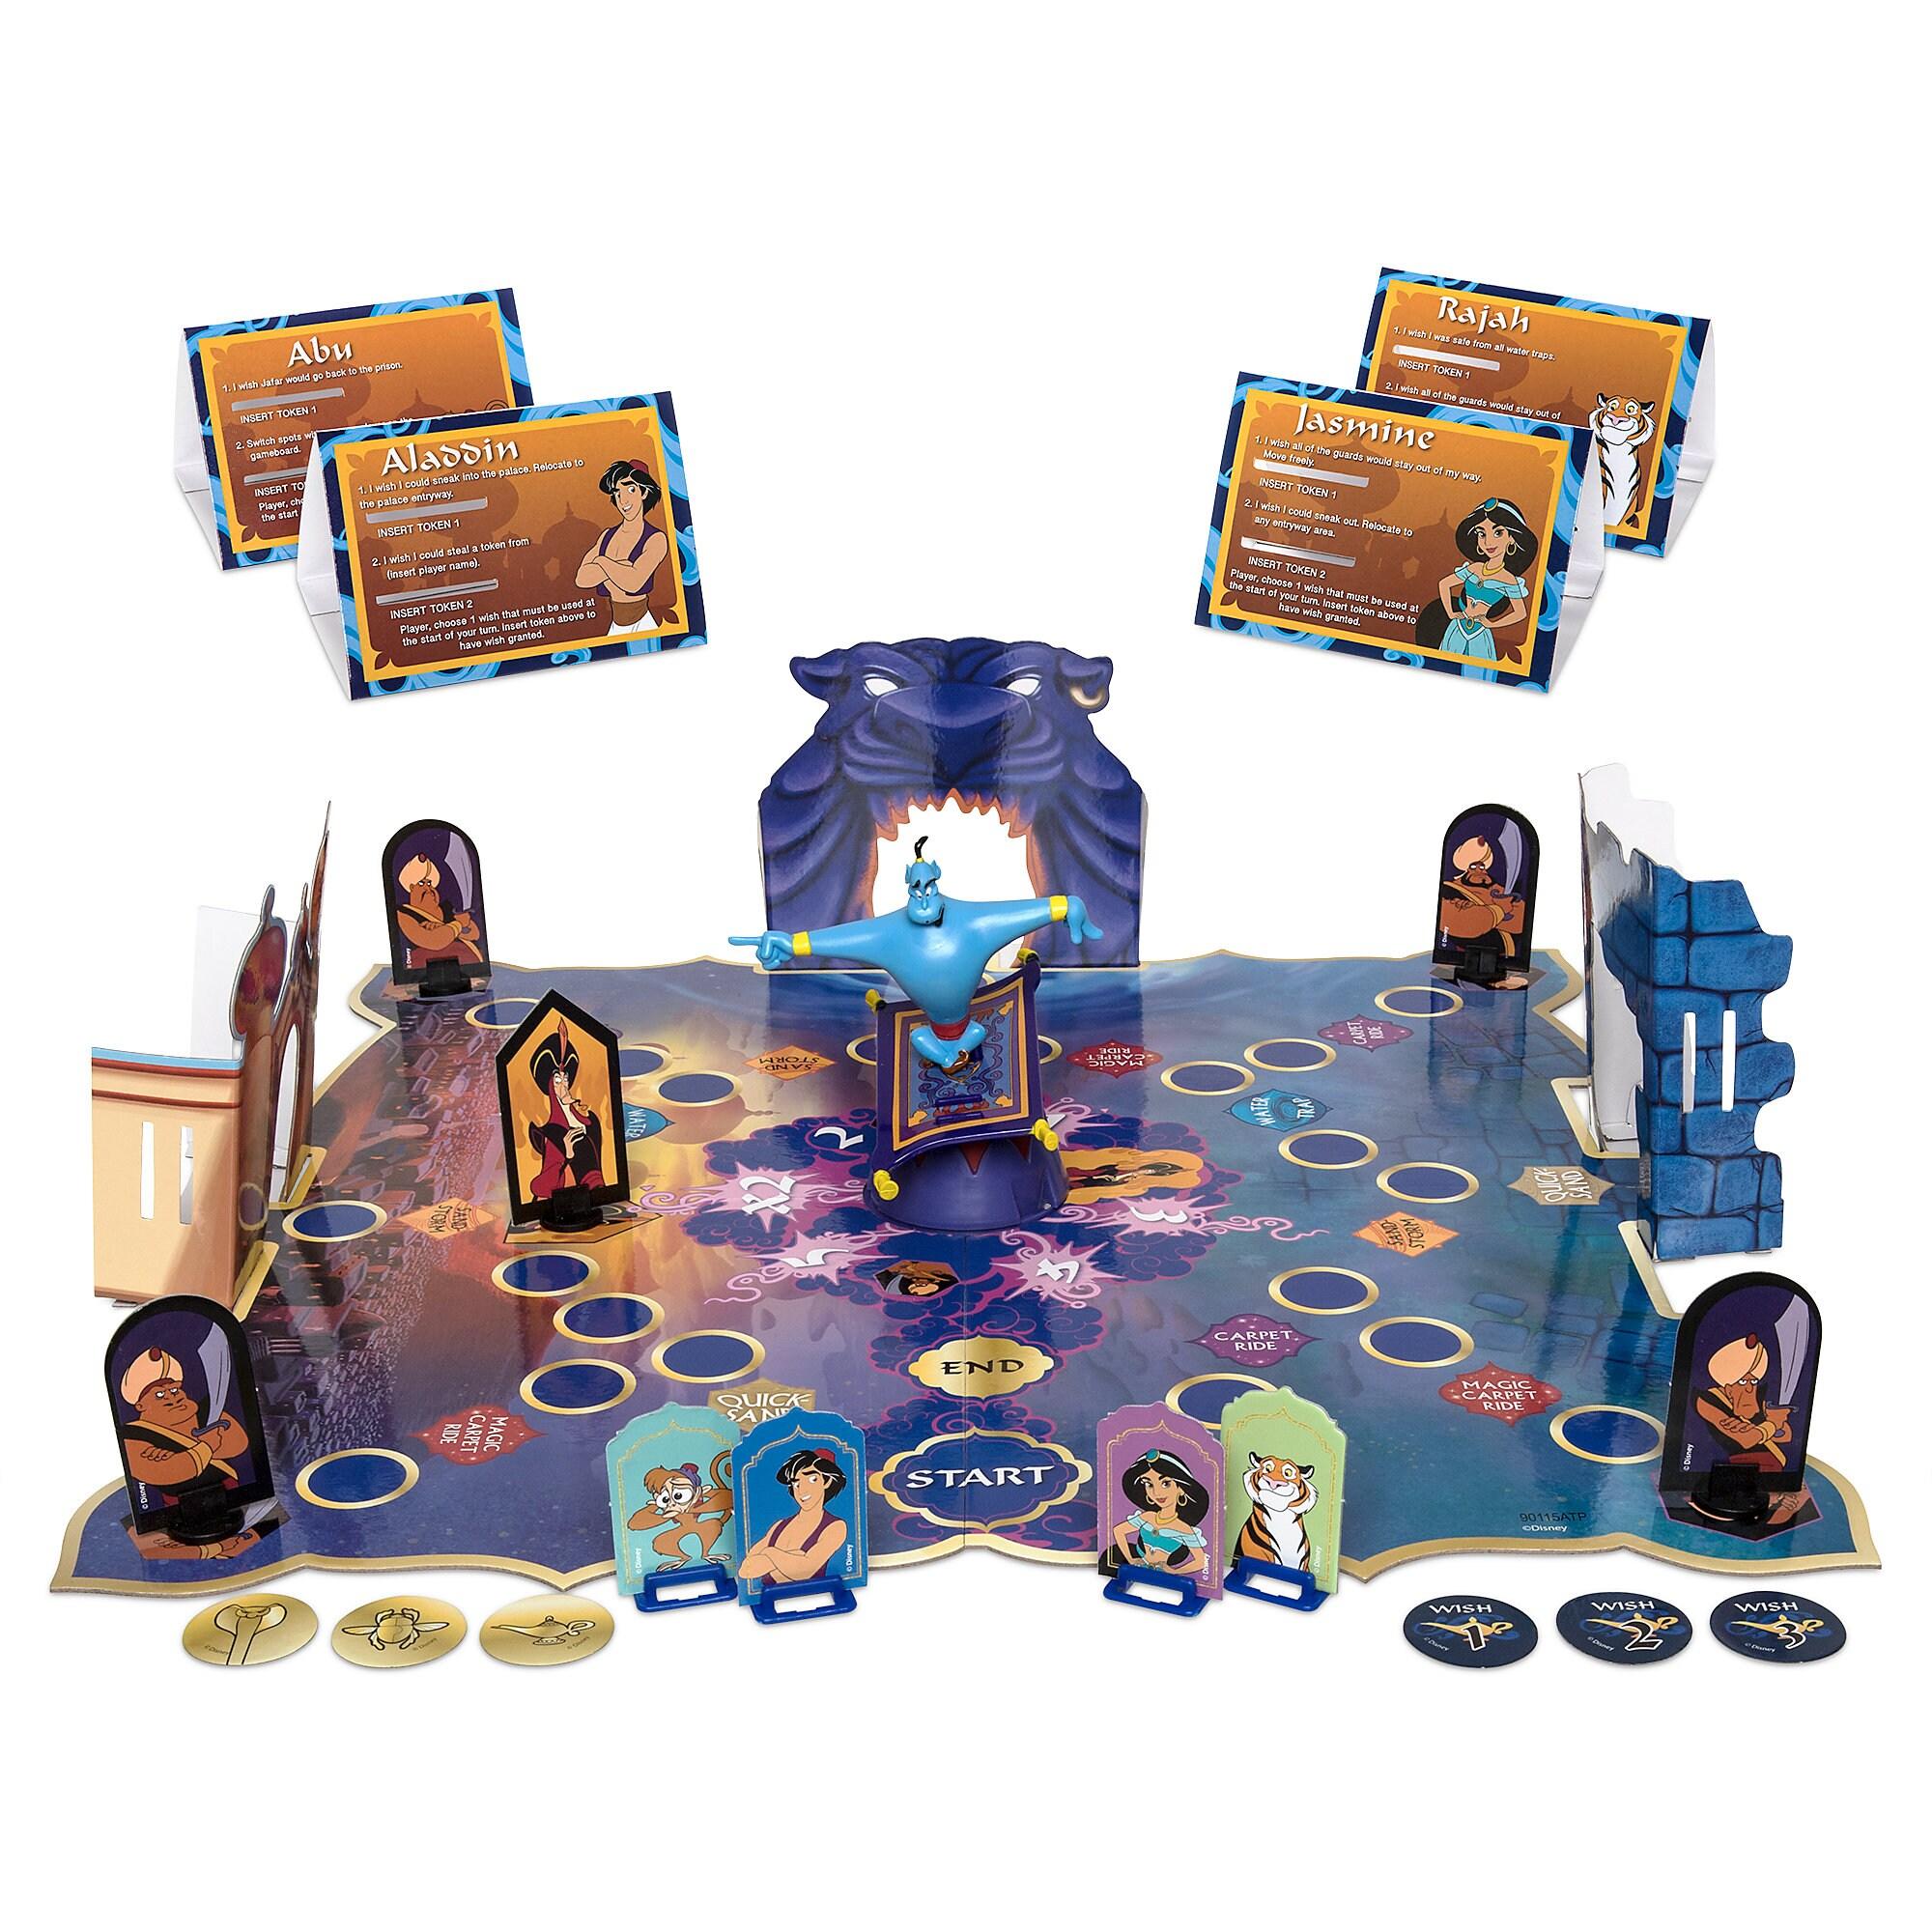 Aladdin The Game